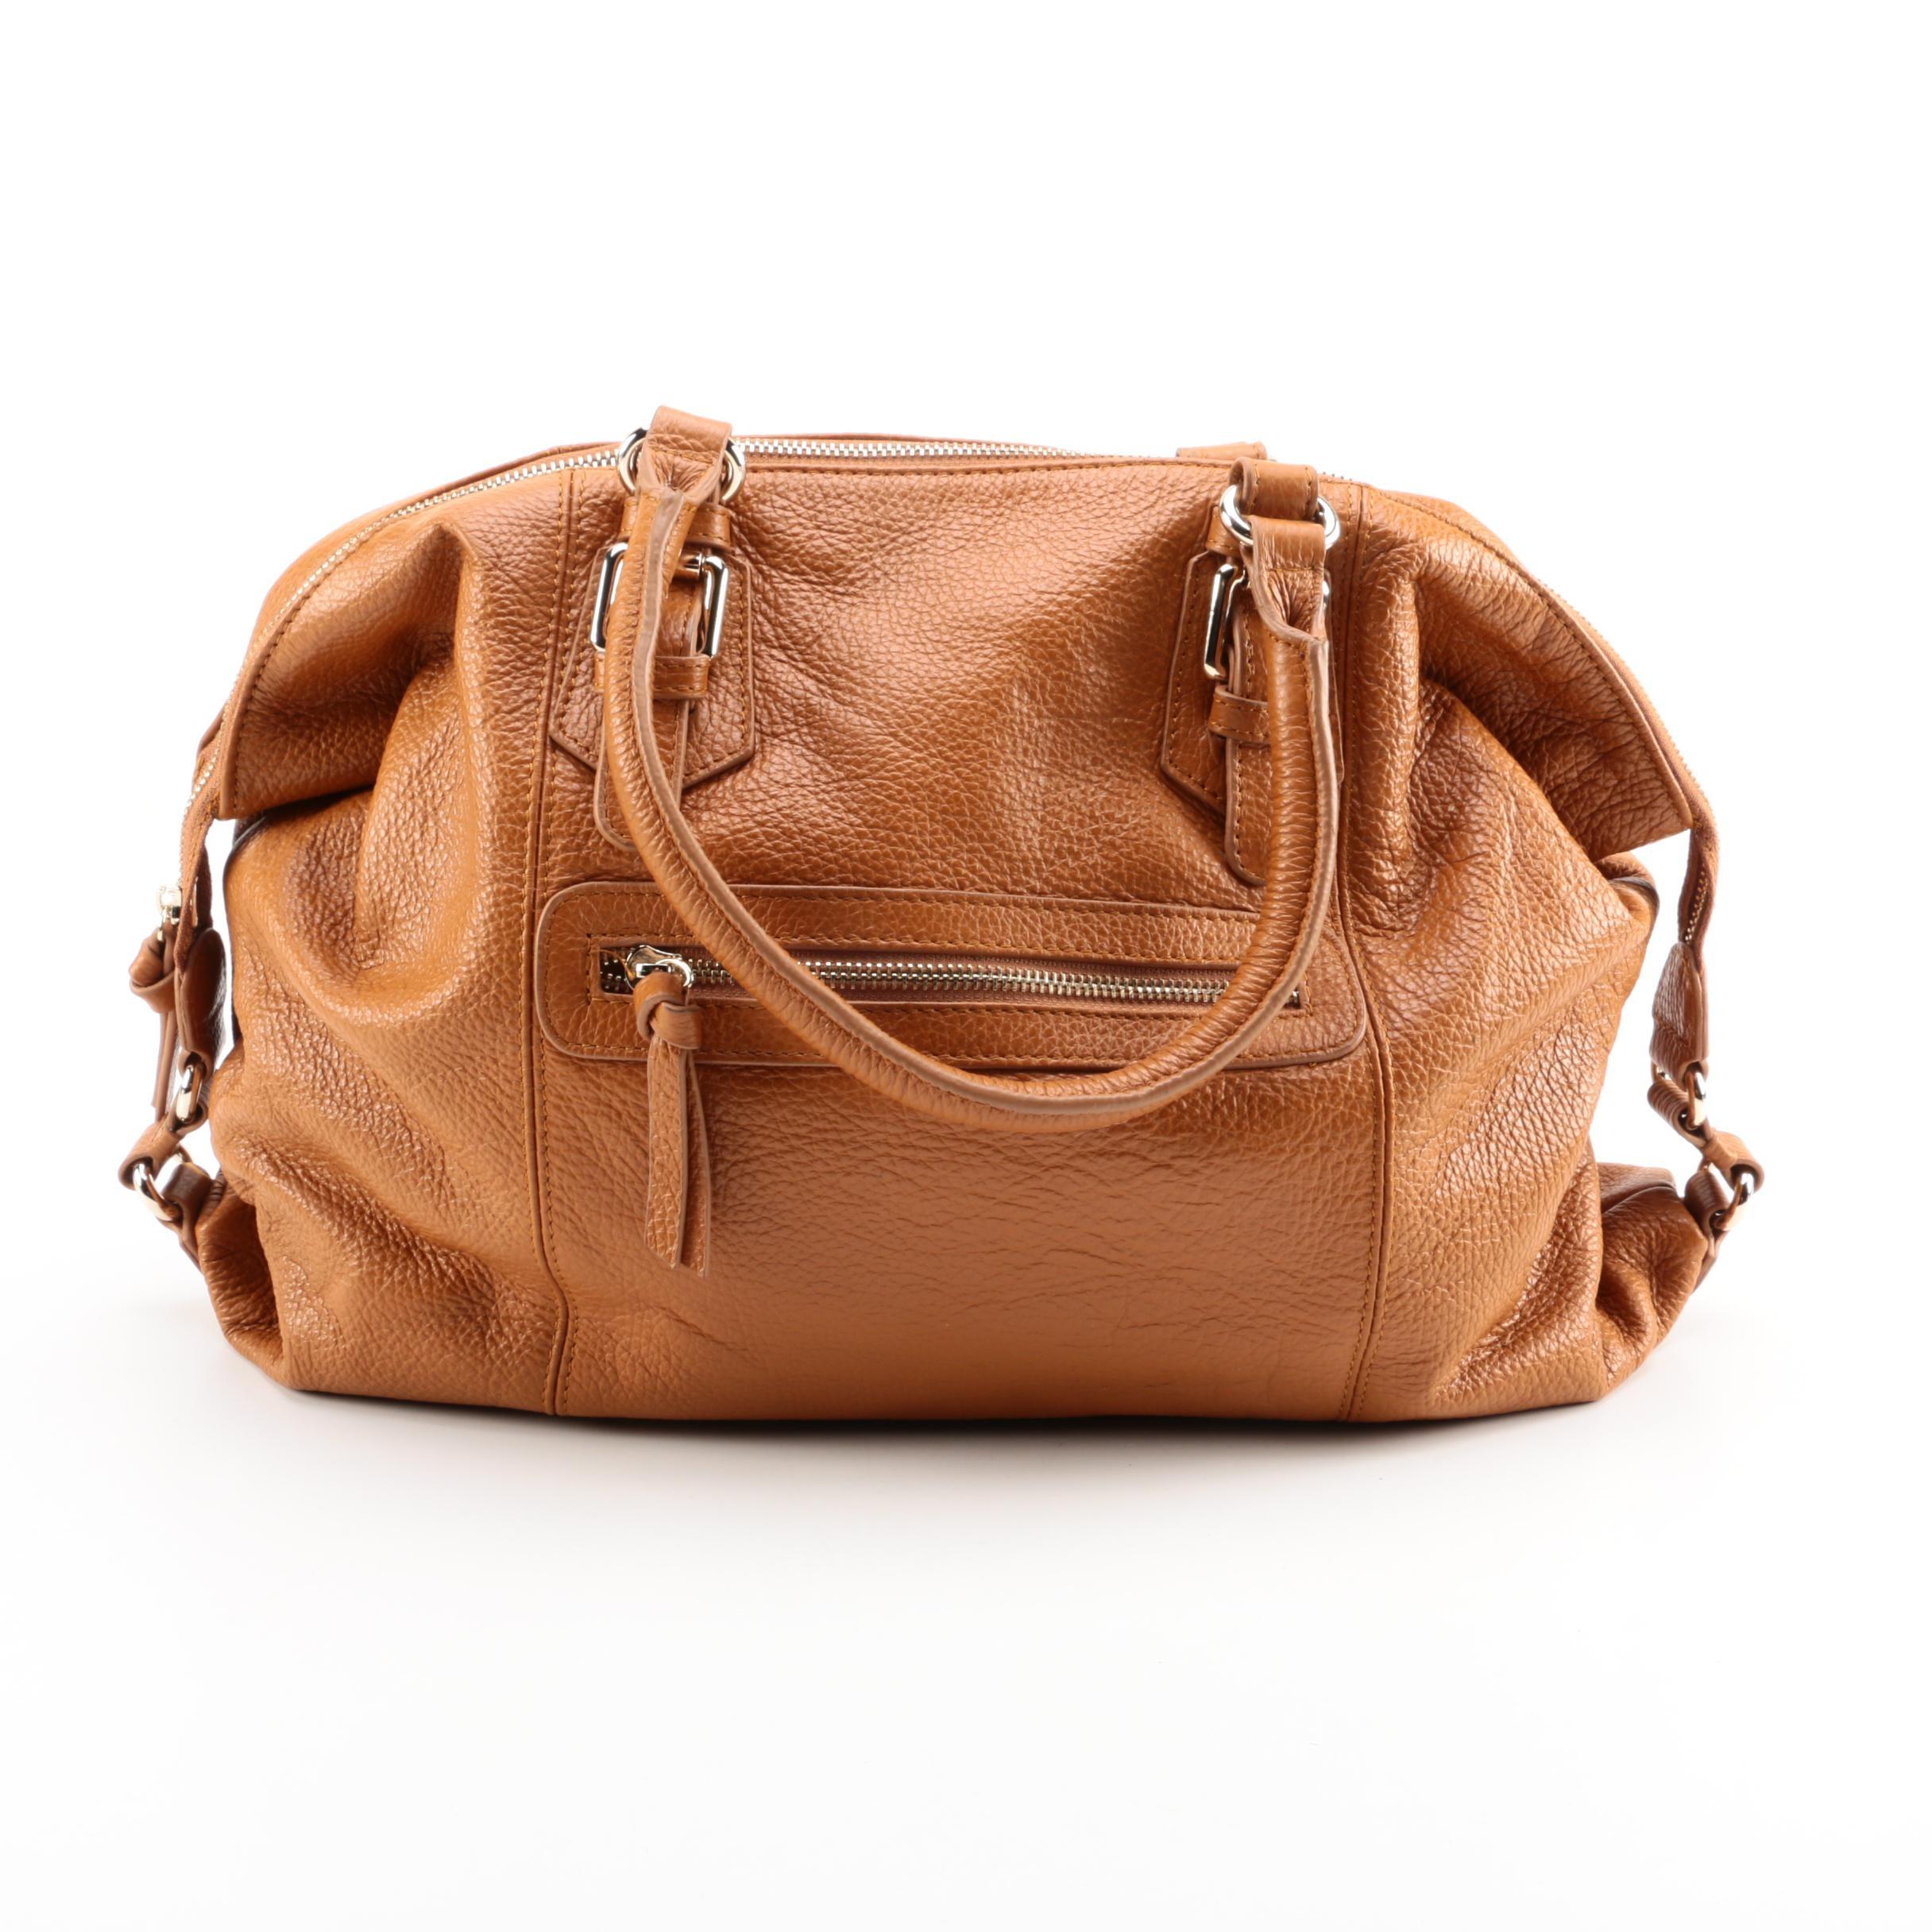 Cyrillus Leather Handbag